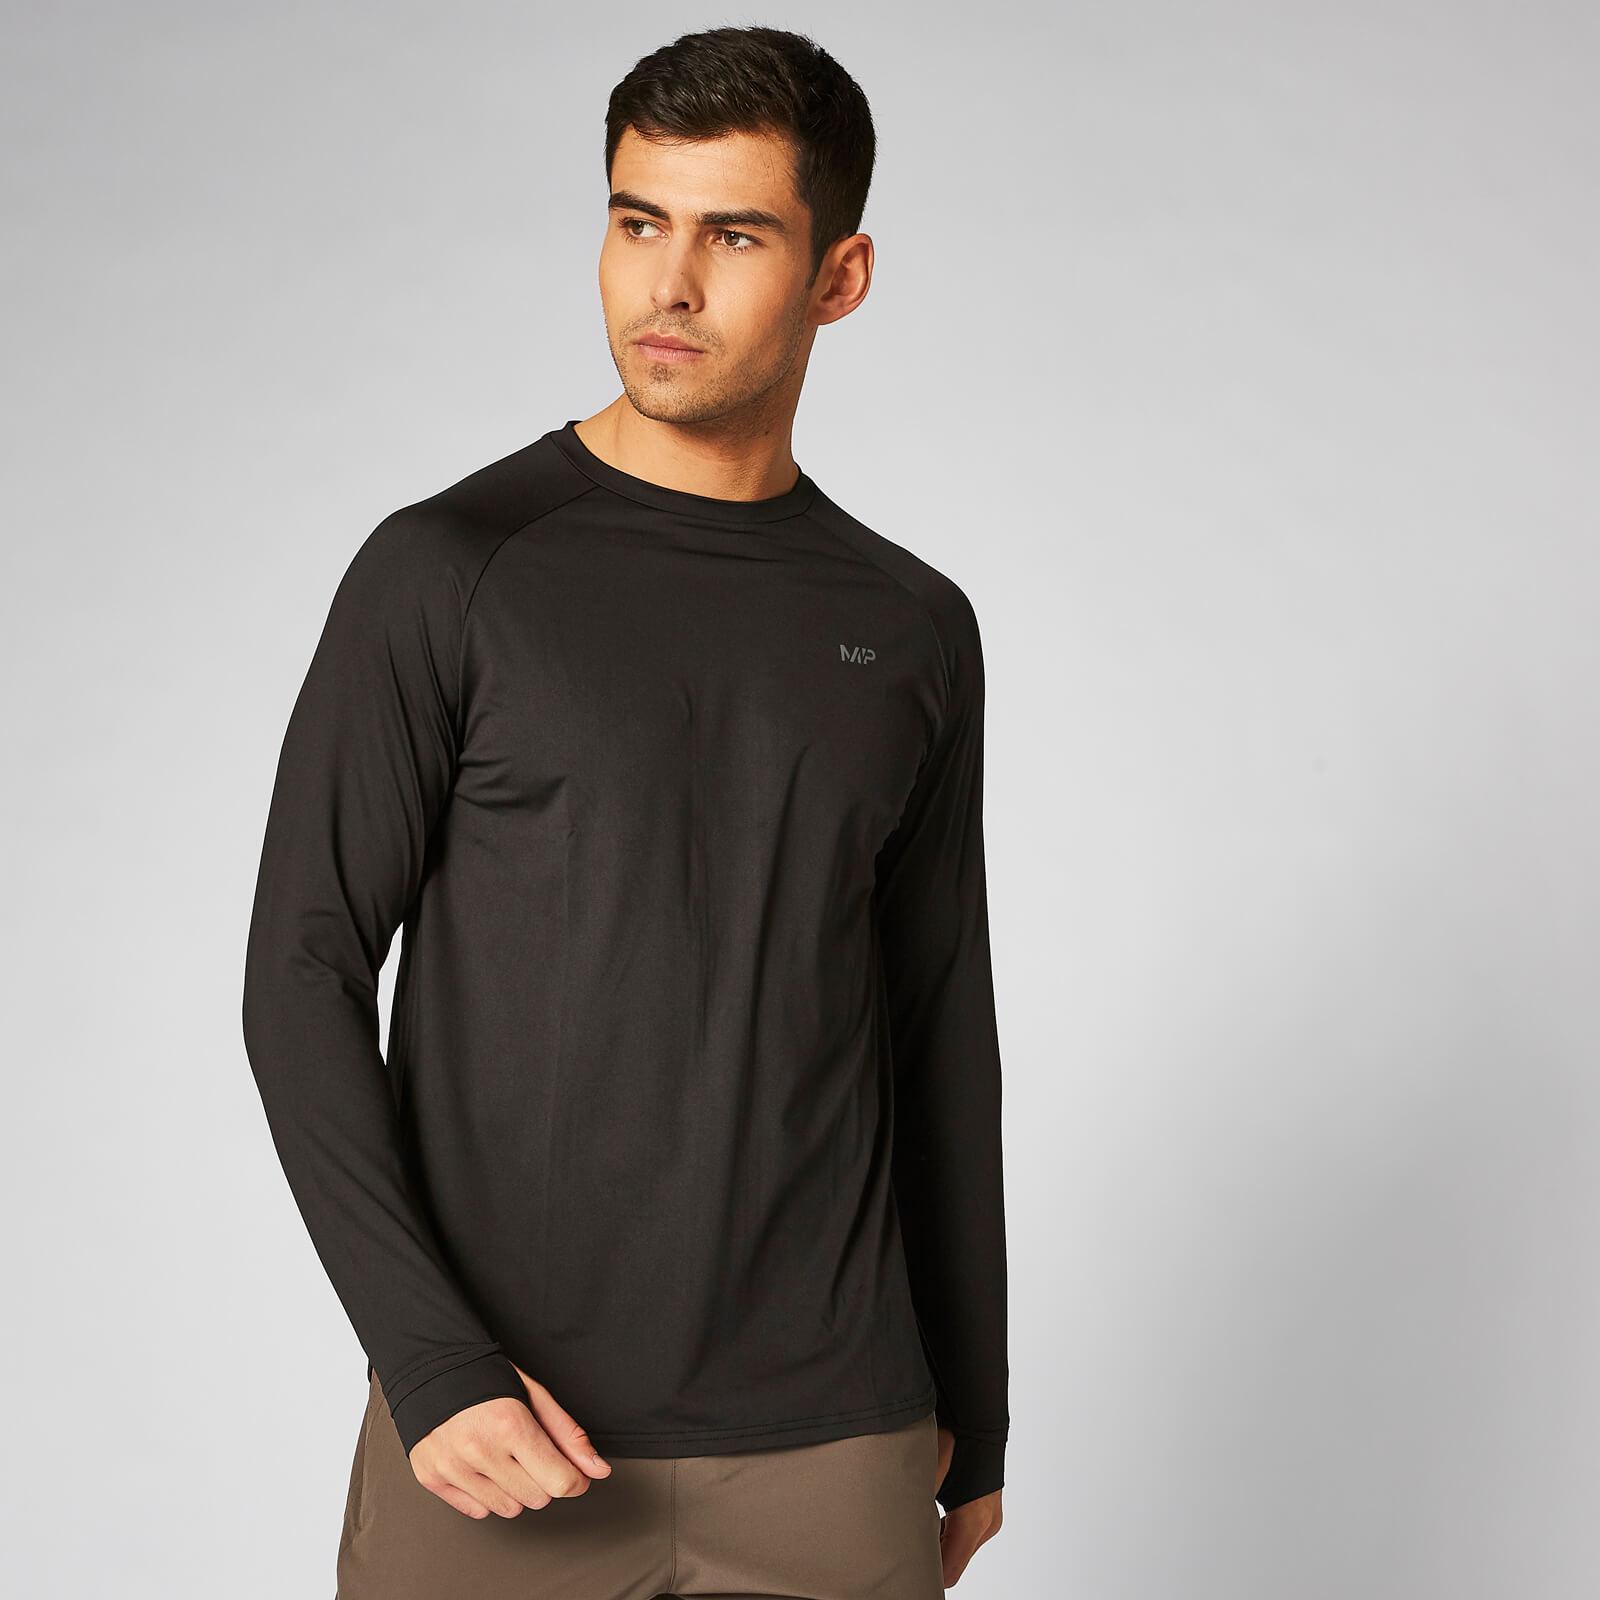 Myprotein Dry-Tech Infinity Long-Sleeve T-Shirt – Black - XS